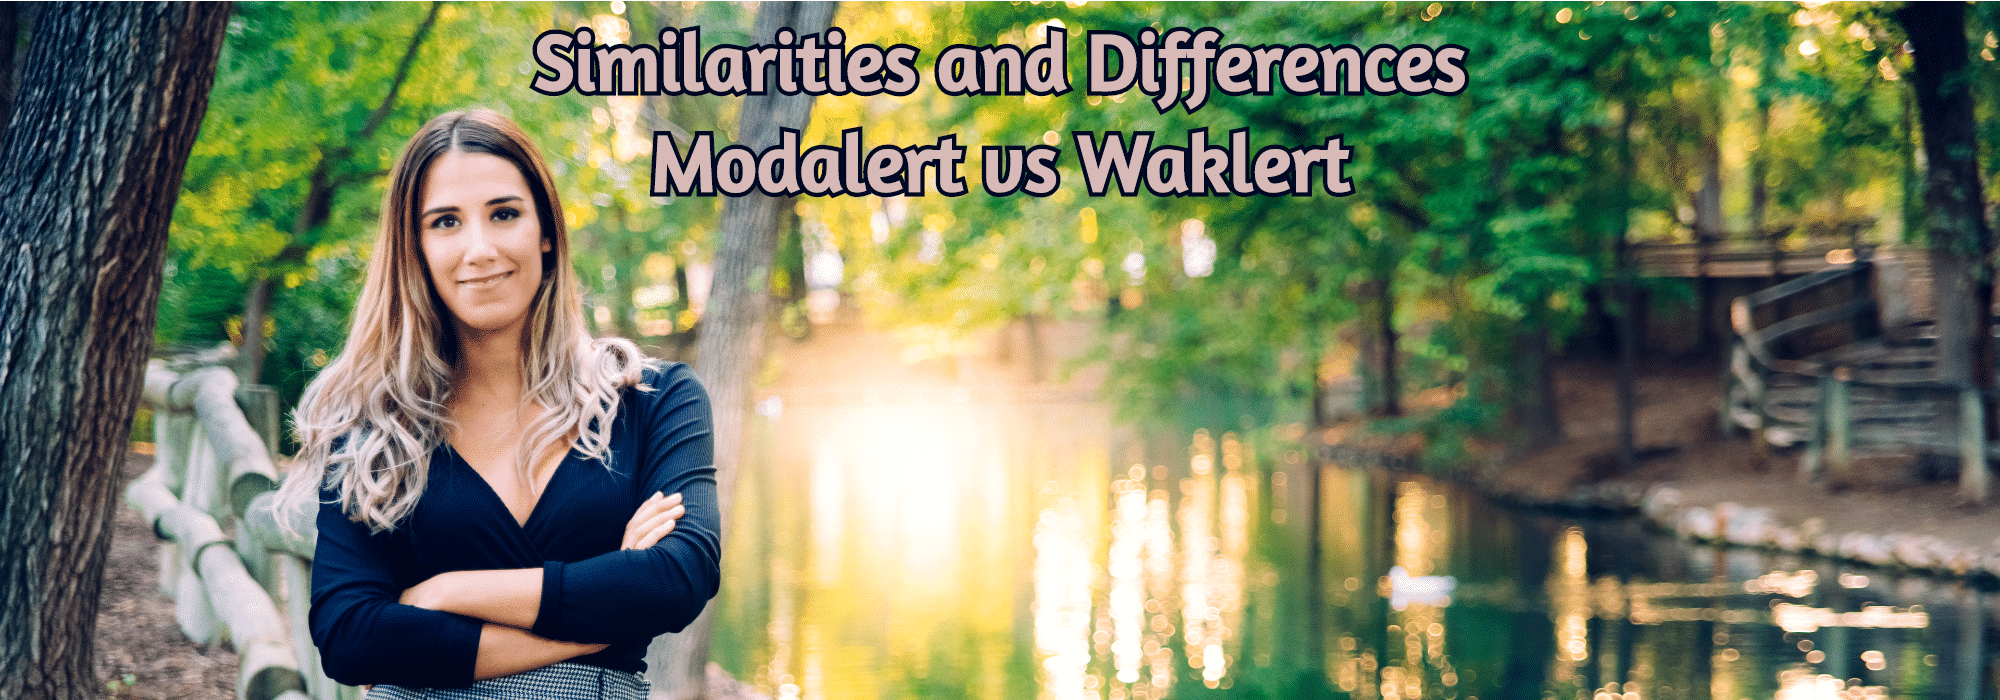 Similarities and Differences, modalert vs waklert